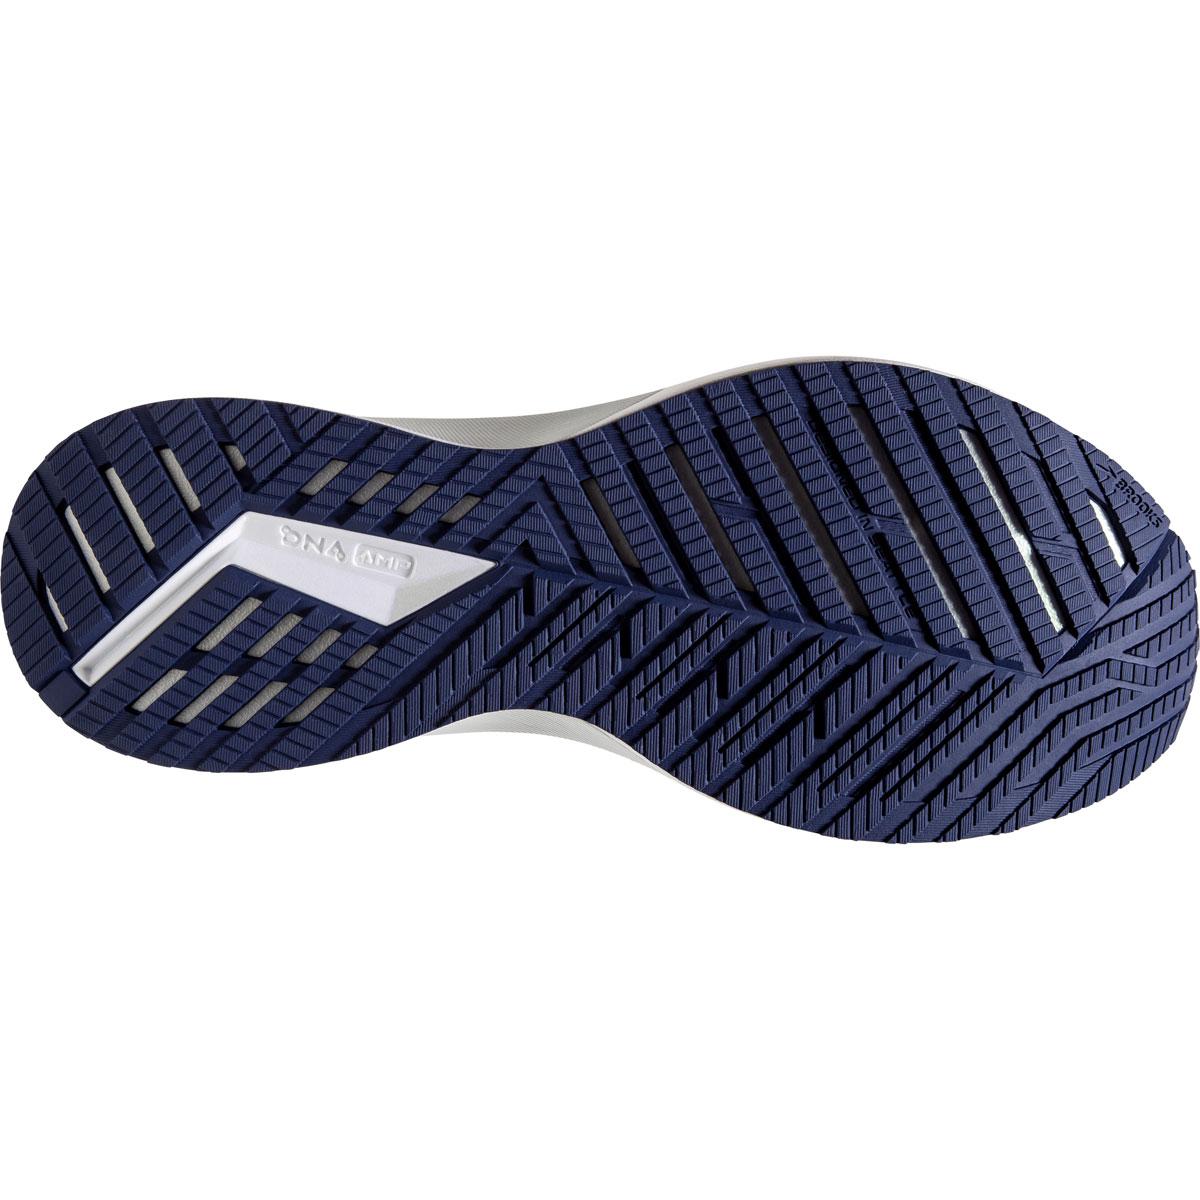 Men's Brooks Levitate 4 Running Shoe - Color: Navy/Grey/White - Size: 7 - Width: Regular, Navy/Grey/White, large, image 4